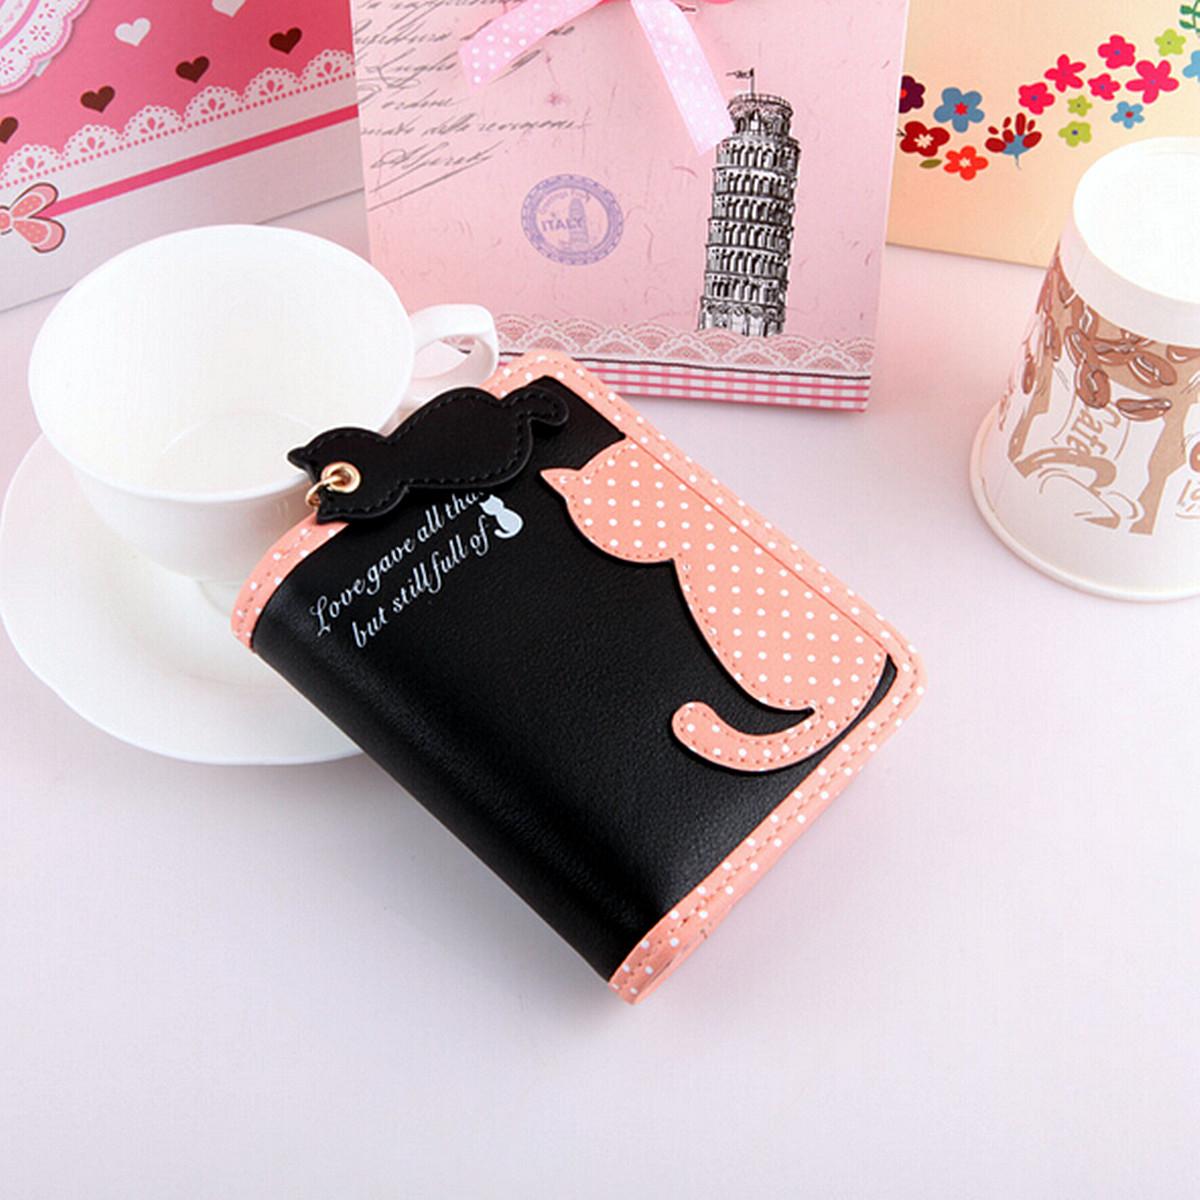 2015 Fashion Women Girl Purse Short Wallet Card Holder Zip Cat Phone Handbag Bag